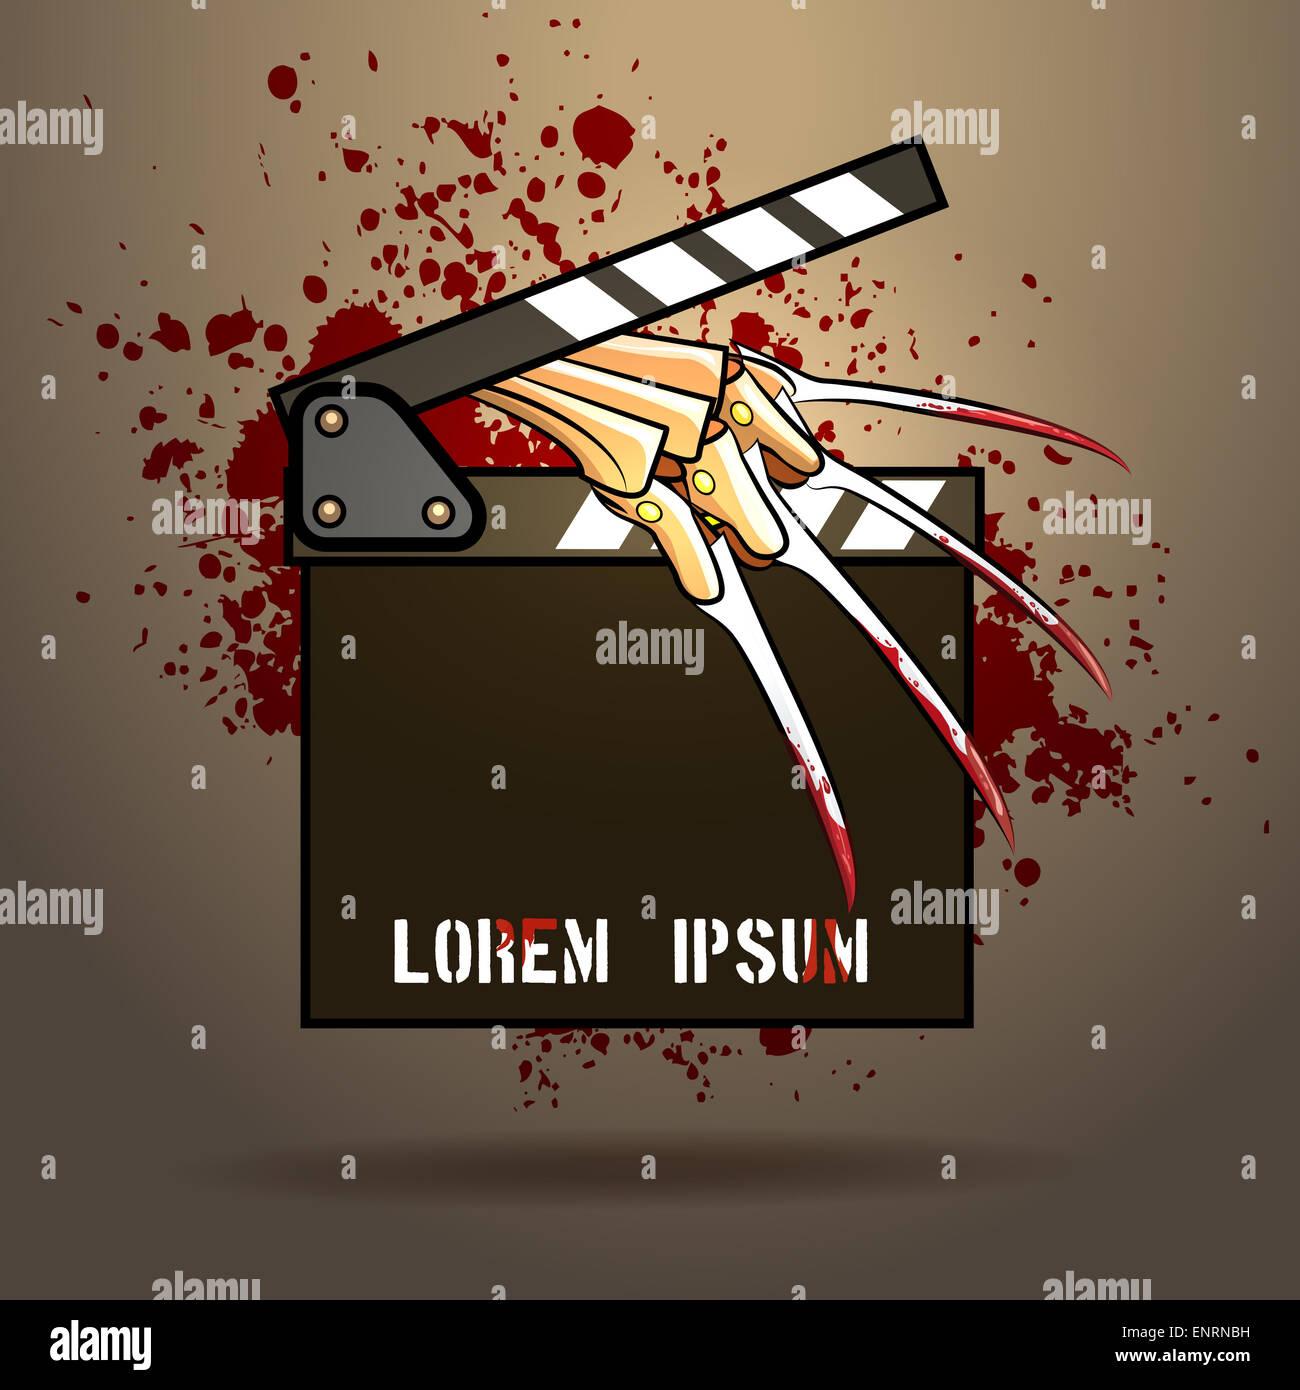 Scary Movie Film Poster Scary Stockfotos & Scary Movie Film Poster ...